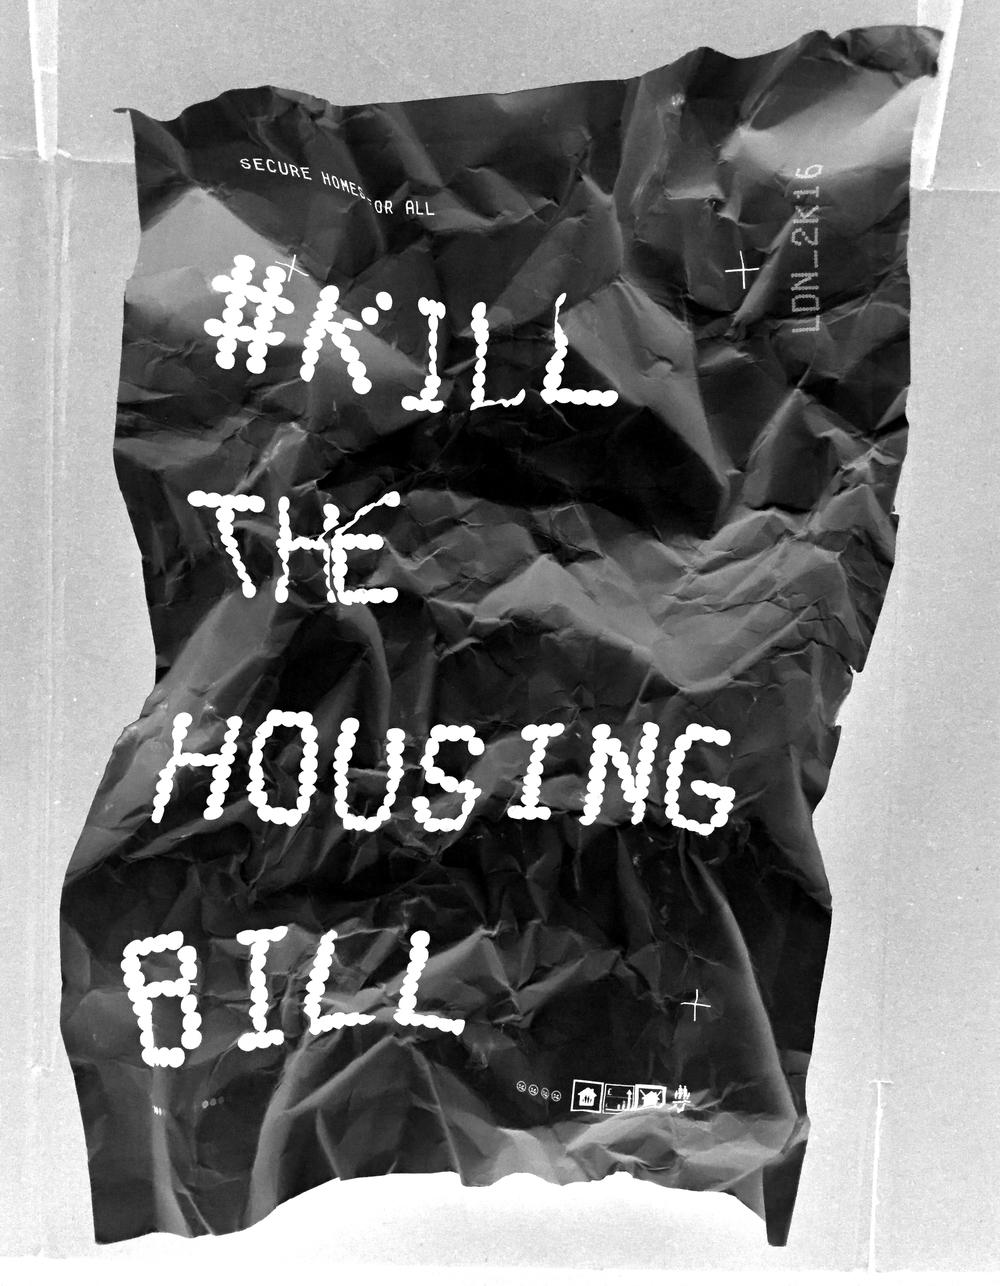 KILLTHEHOUSINGBILL_screwedupBIG©SNUFFCREATIVE2016.jpg